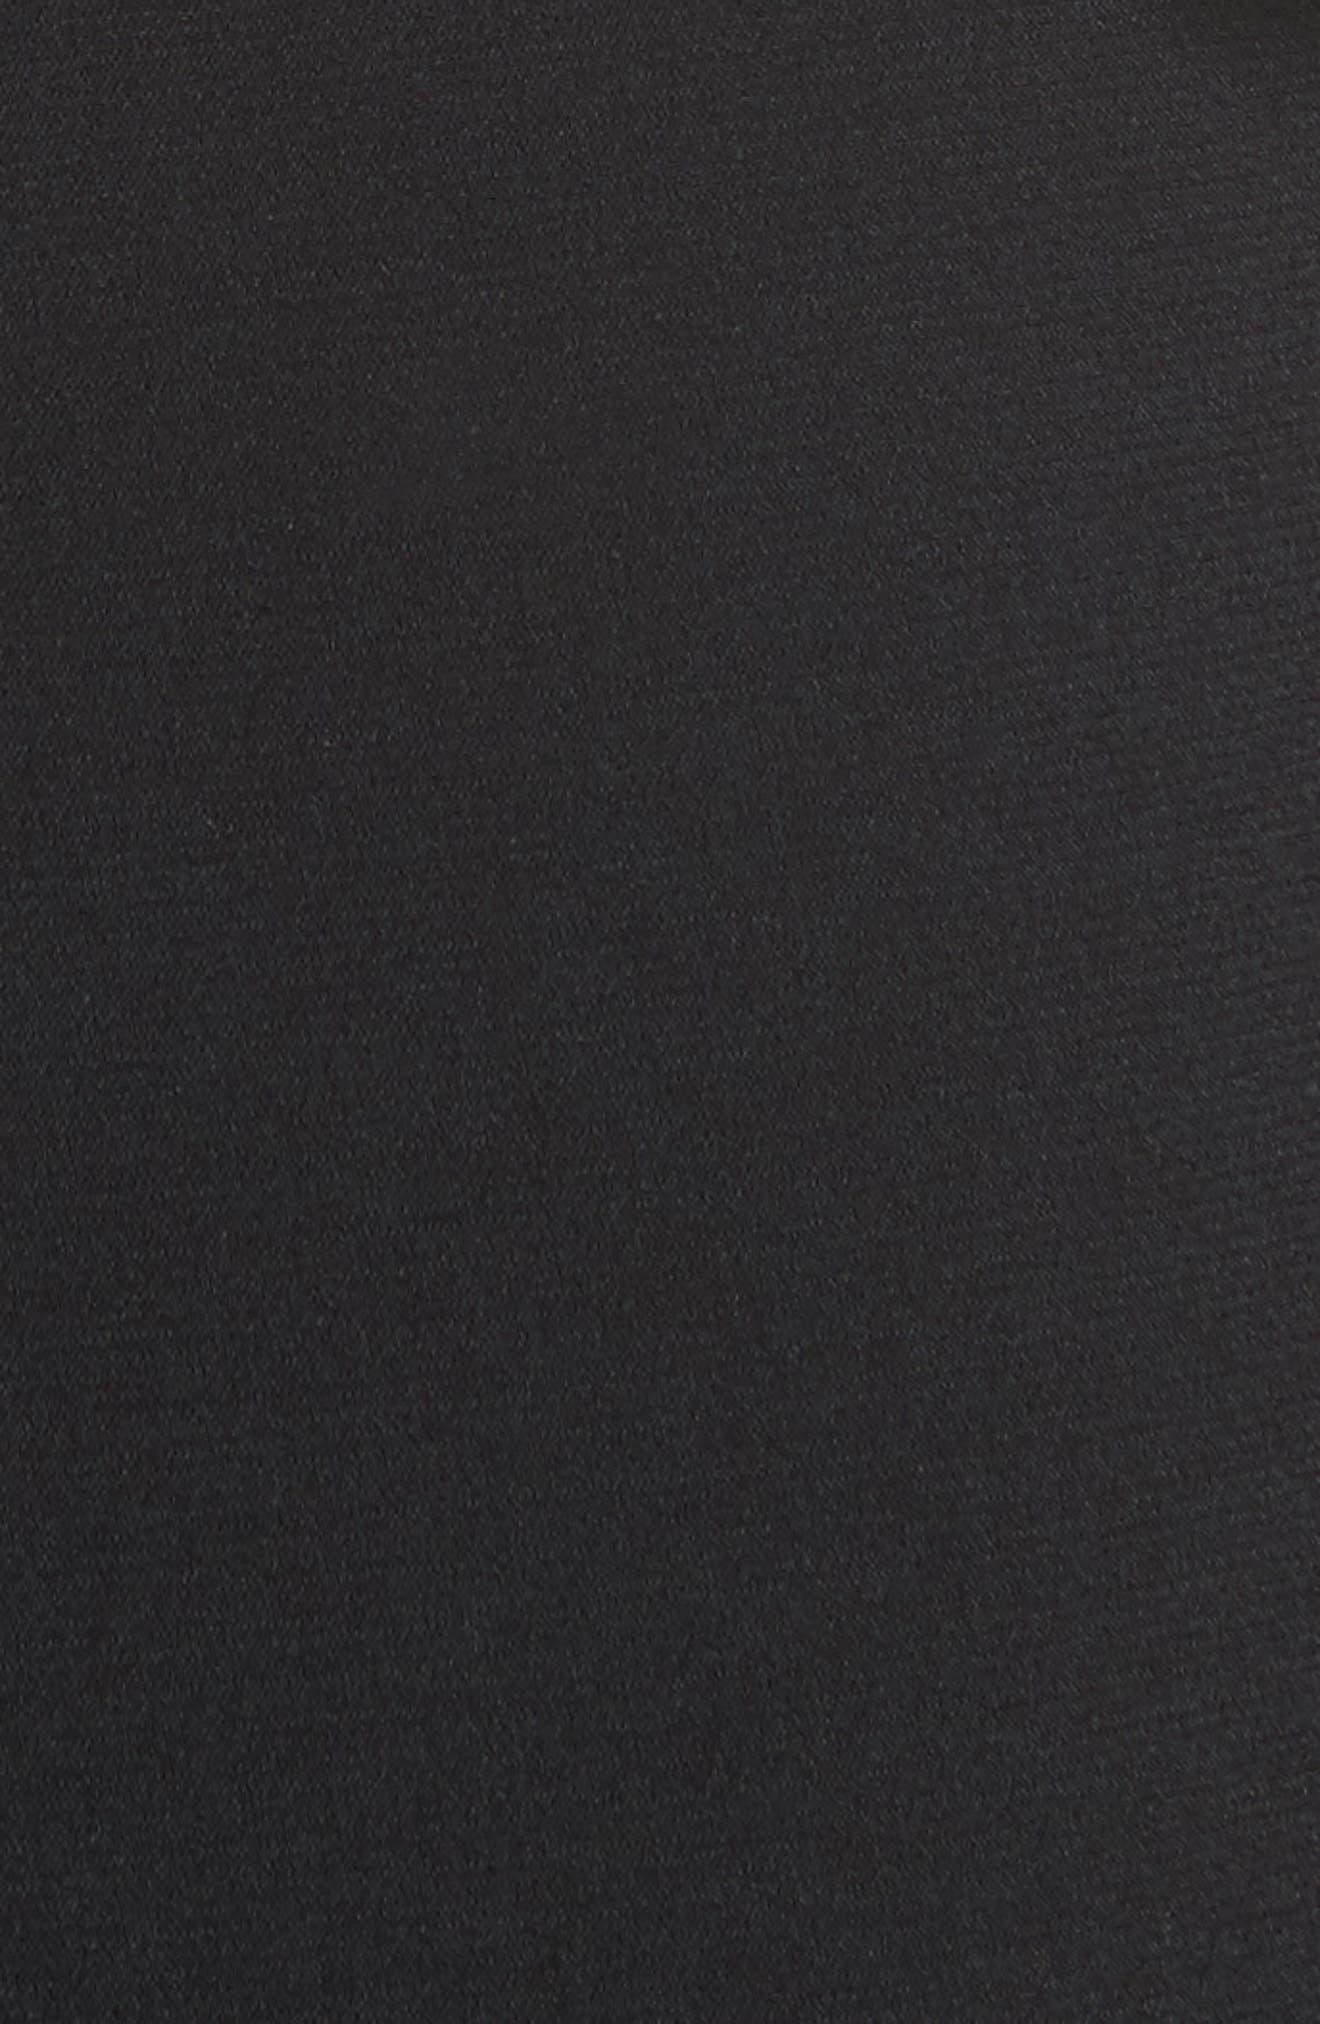 Lavete Stretch Crepe Midi Dress,                             Alternate thumbnail 6, color,                             BLACK